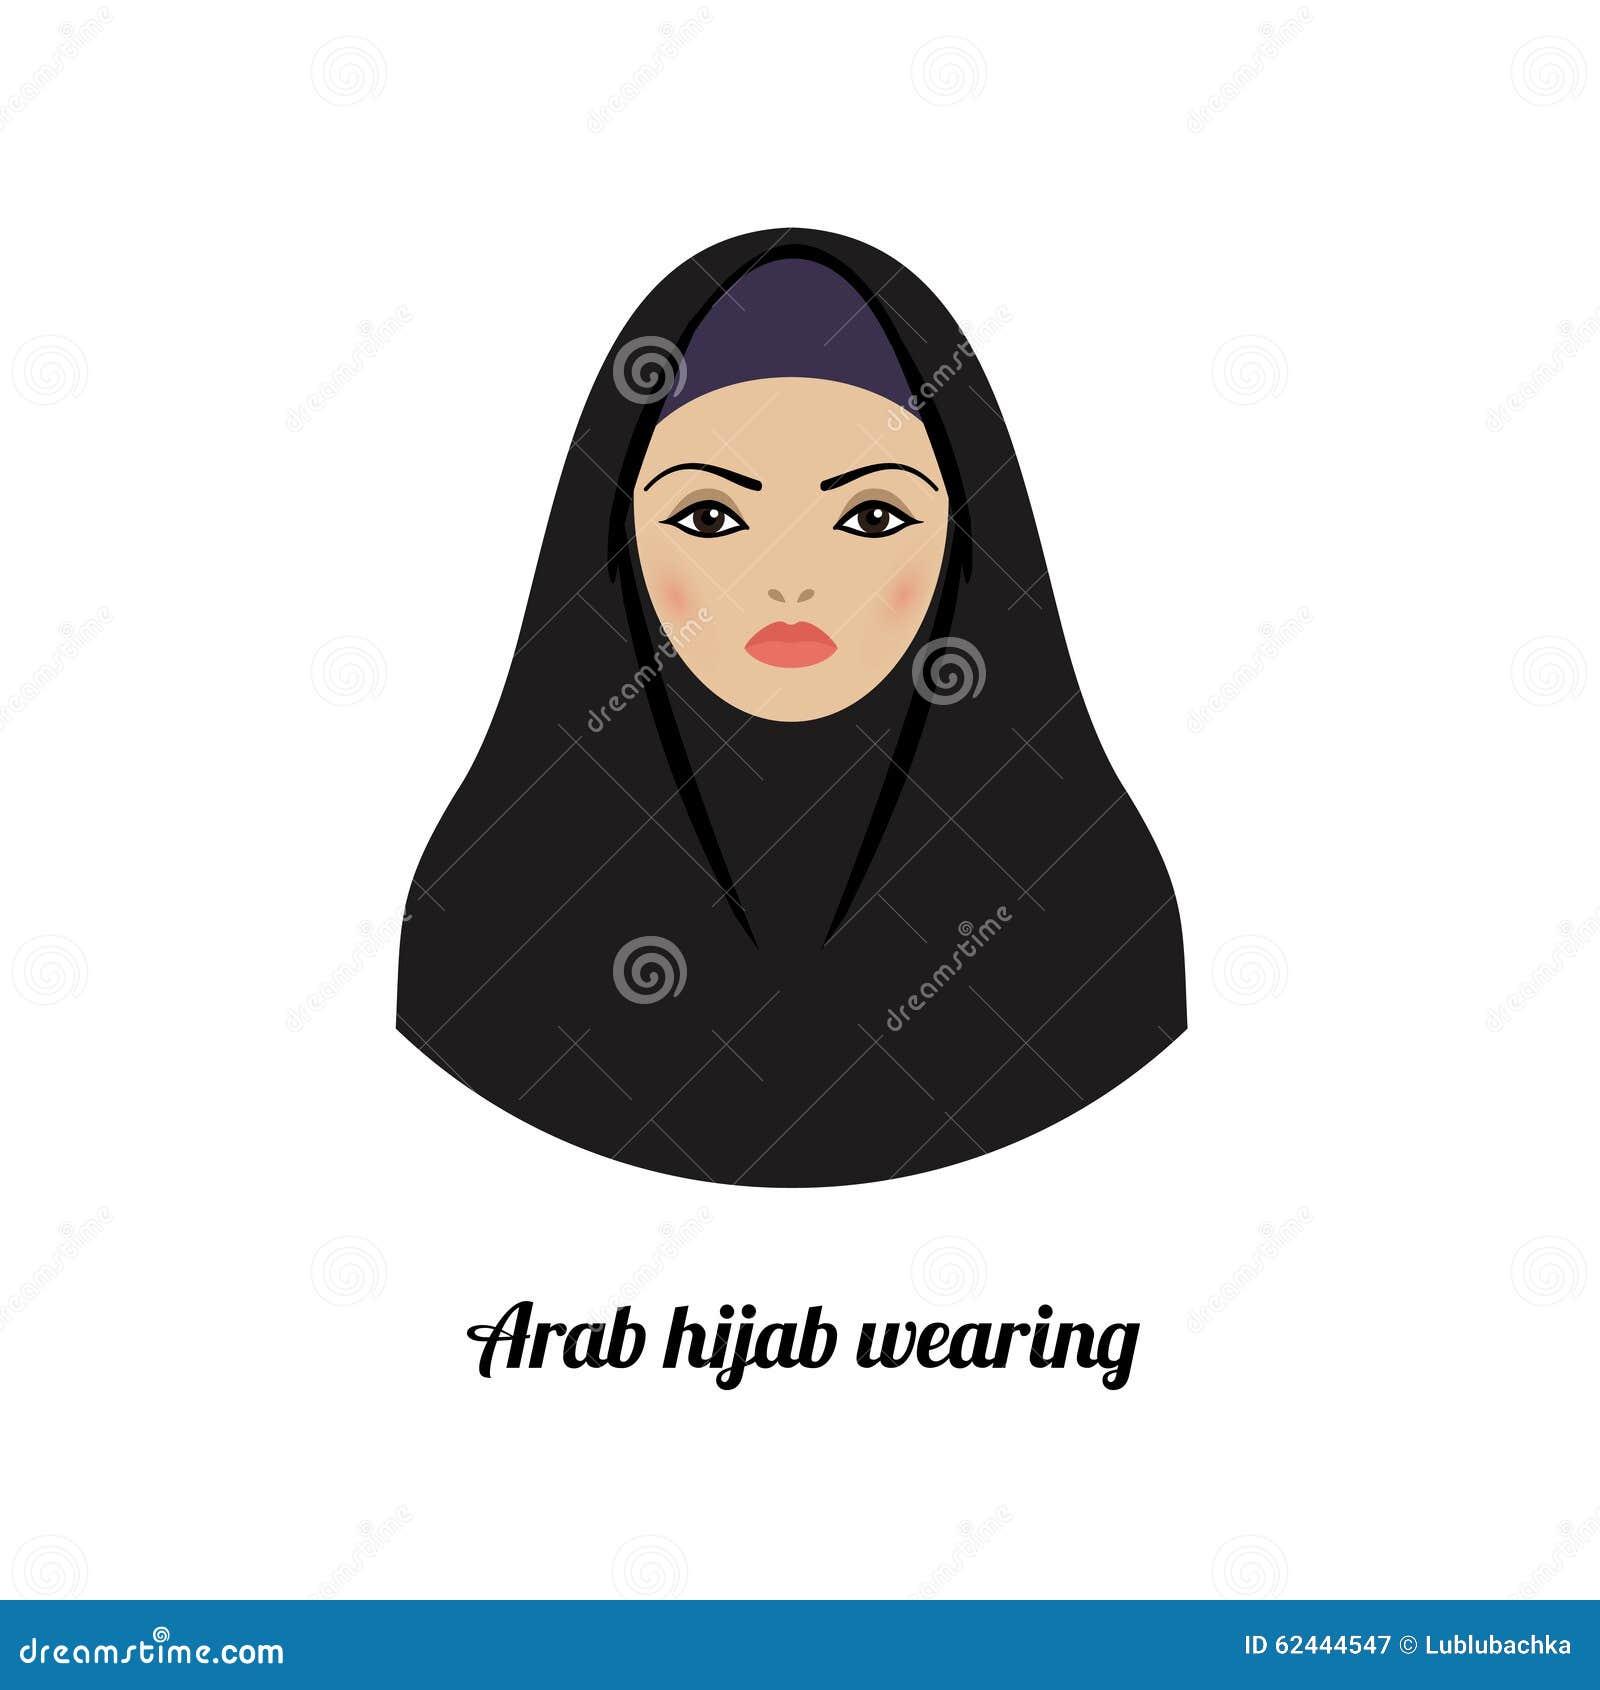 Muslim Girl Avatar Asian Muslim Traditional Hijab Wearing Stock Photo - Image 62444547-1047